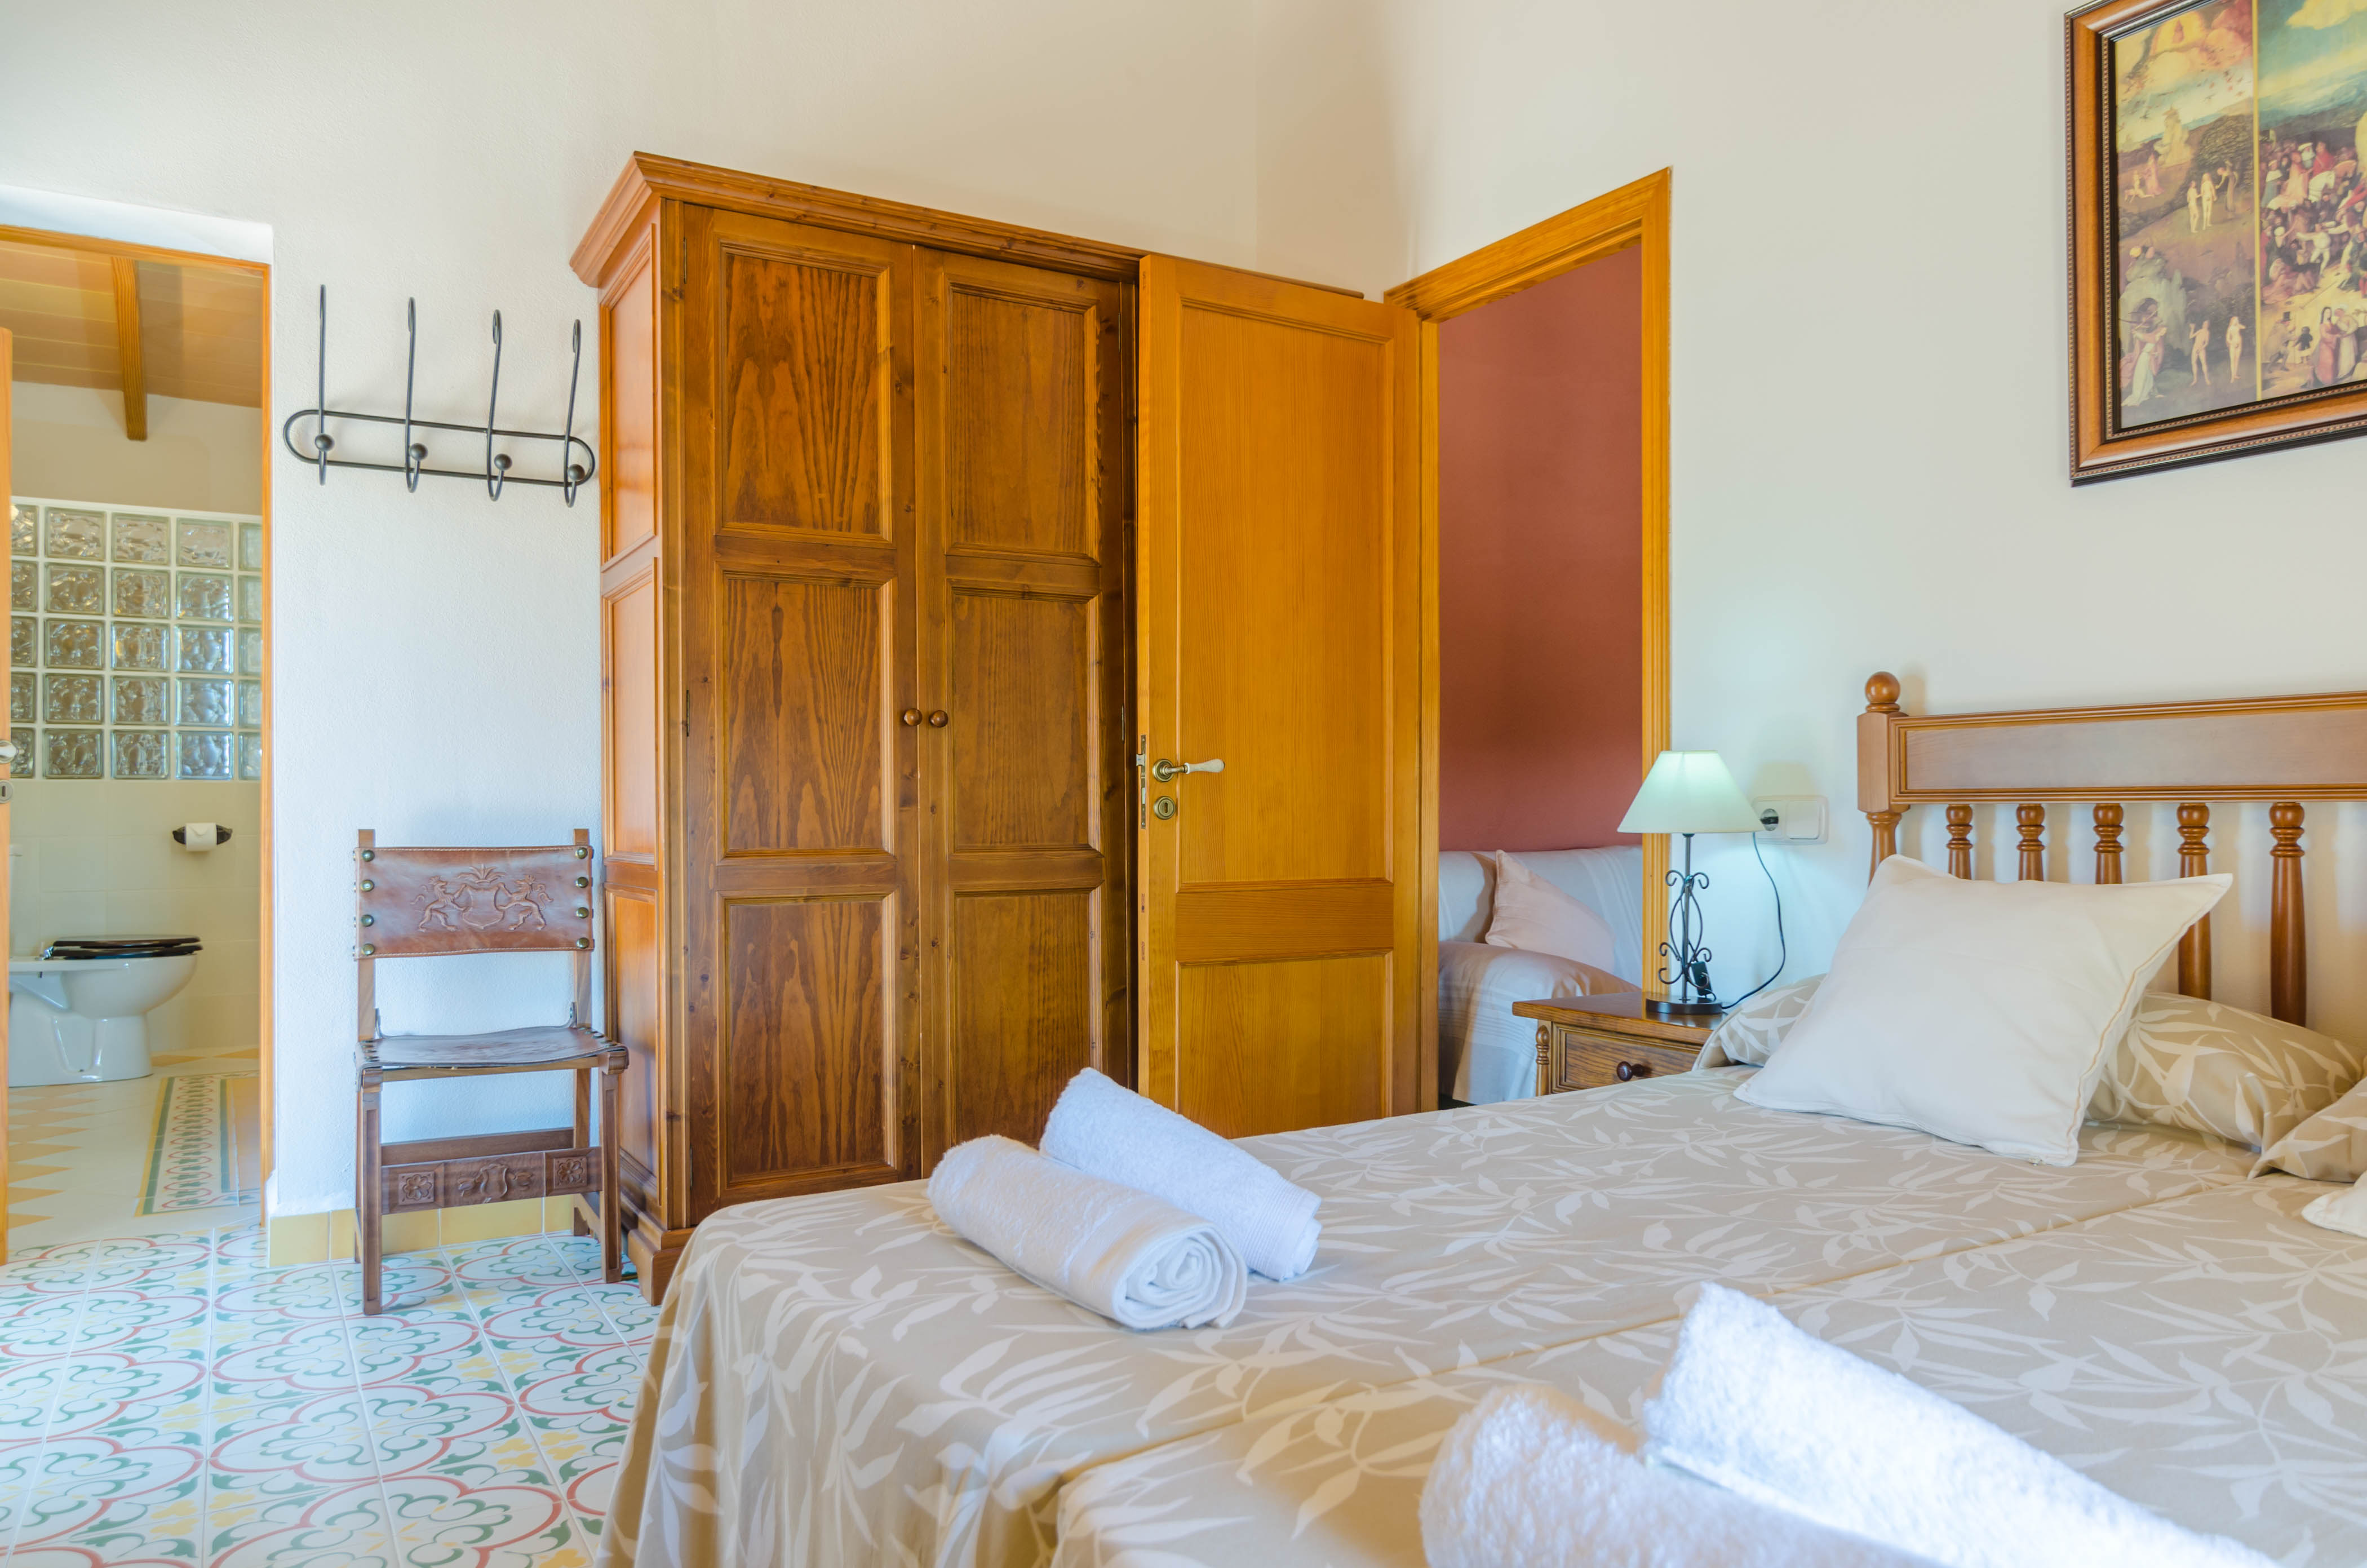 Ferienhaus SON MACIA (2186582), Son Macià, Mallorca, Balearische Inseln, Spanien, Bild 42